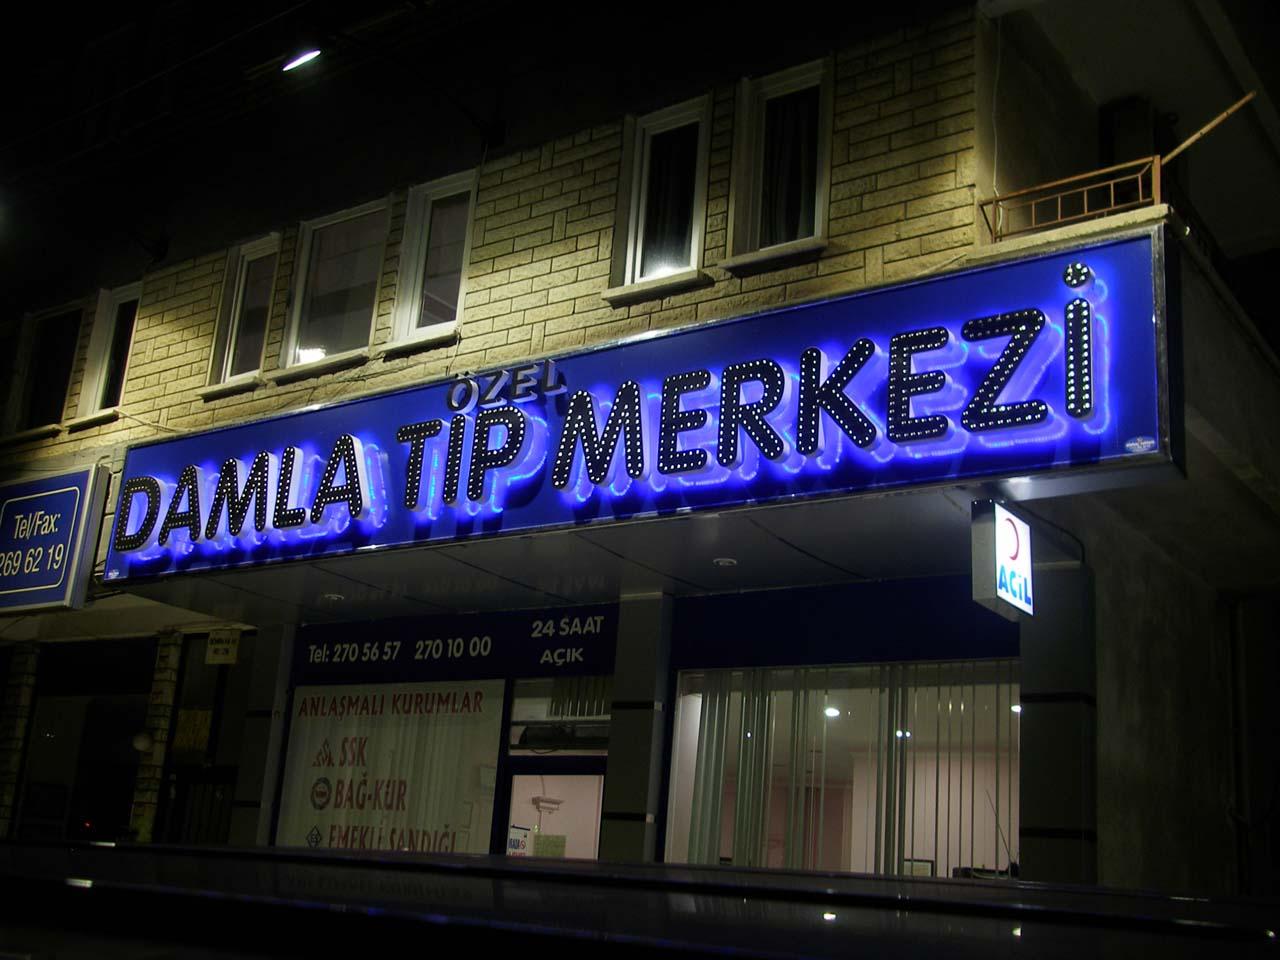 Cephe Tabelası, Tabela, Ankara, Ankara Tabela, Ankara Cephe Tabelası, Işıklı Tabela, Işıksız Tabela, Vinil Tabela, Branda Tabela, Tabela Ankara